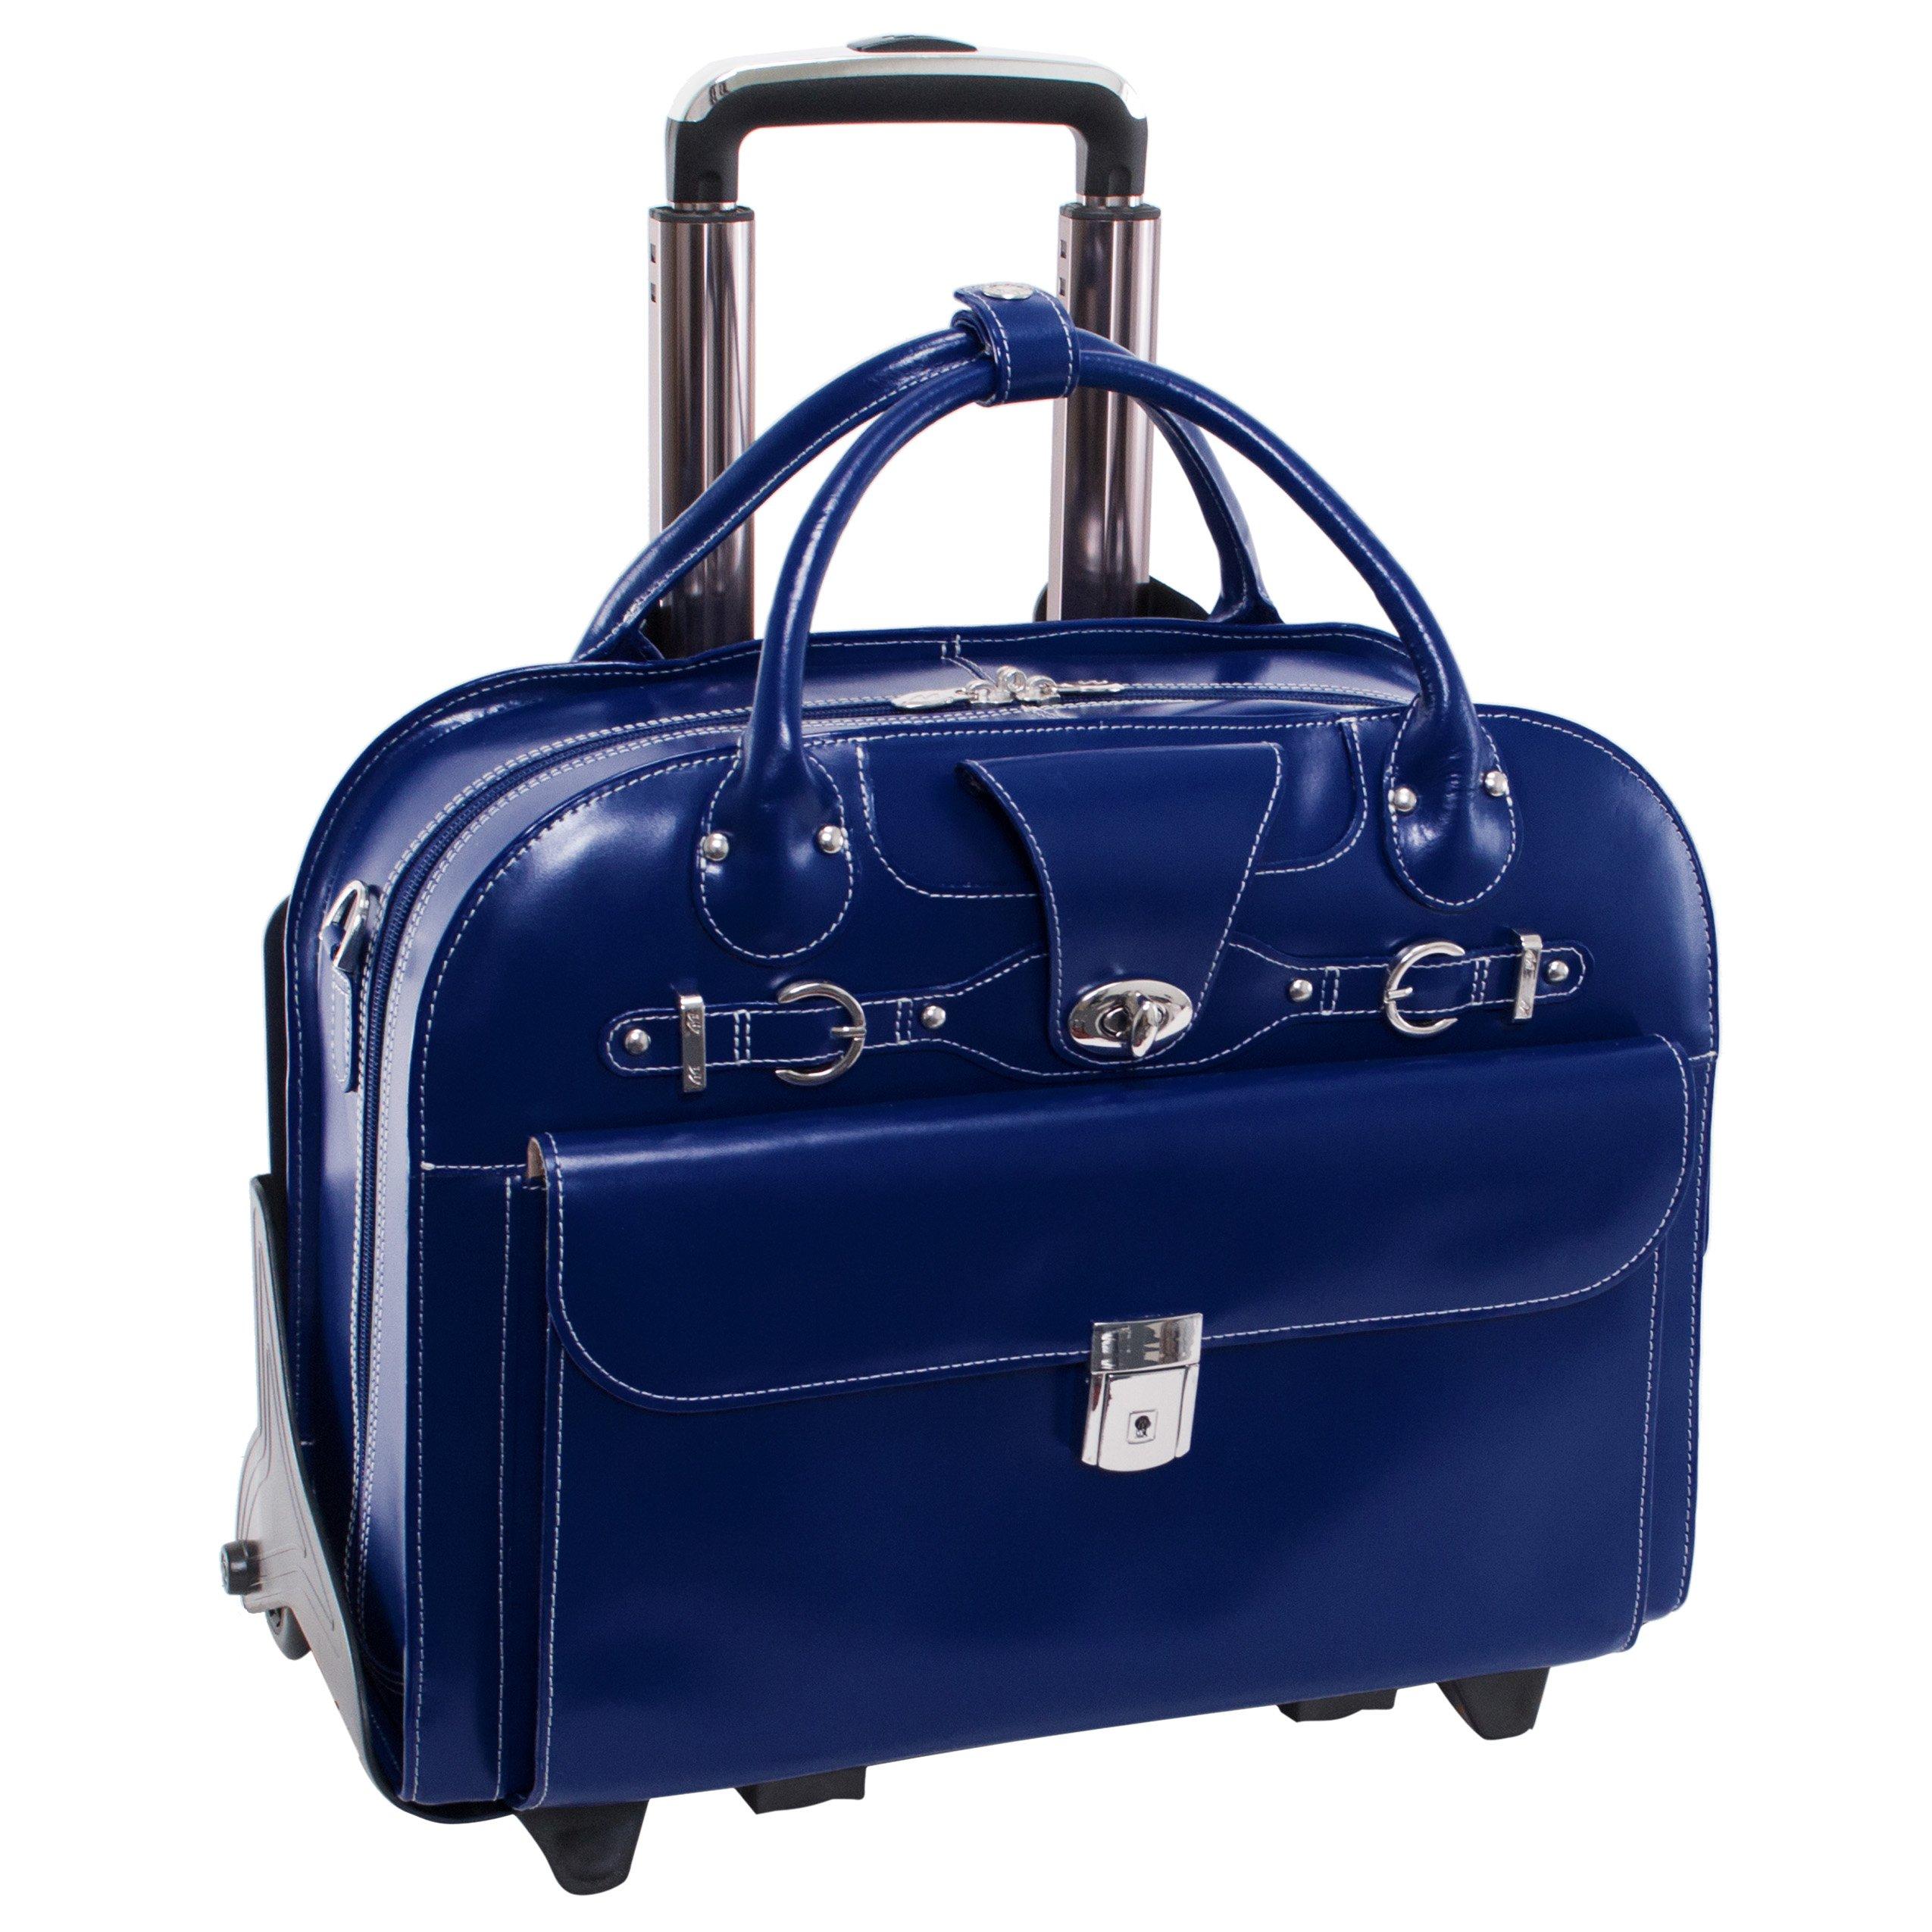 McKlein USA Roseville Navy 15.6'' Leather Fly, Friendly Detachable, Wheeled Ladies' Briefcase (96647) by McKleinUSA